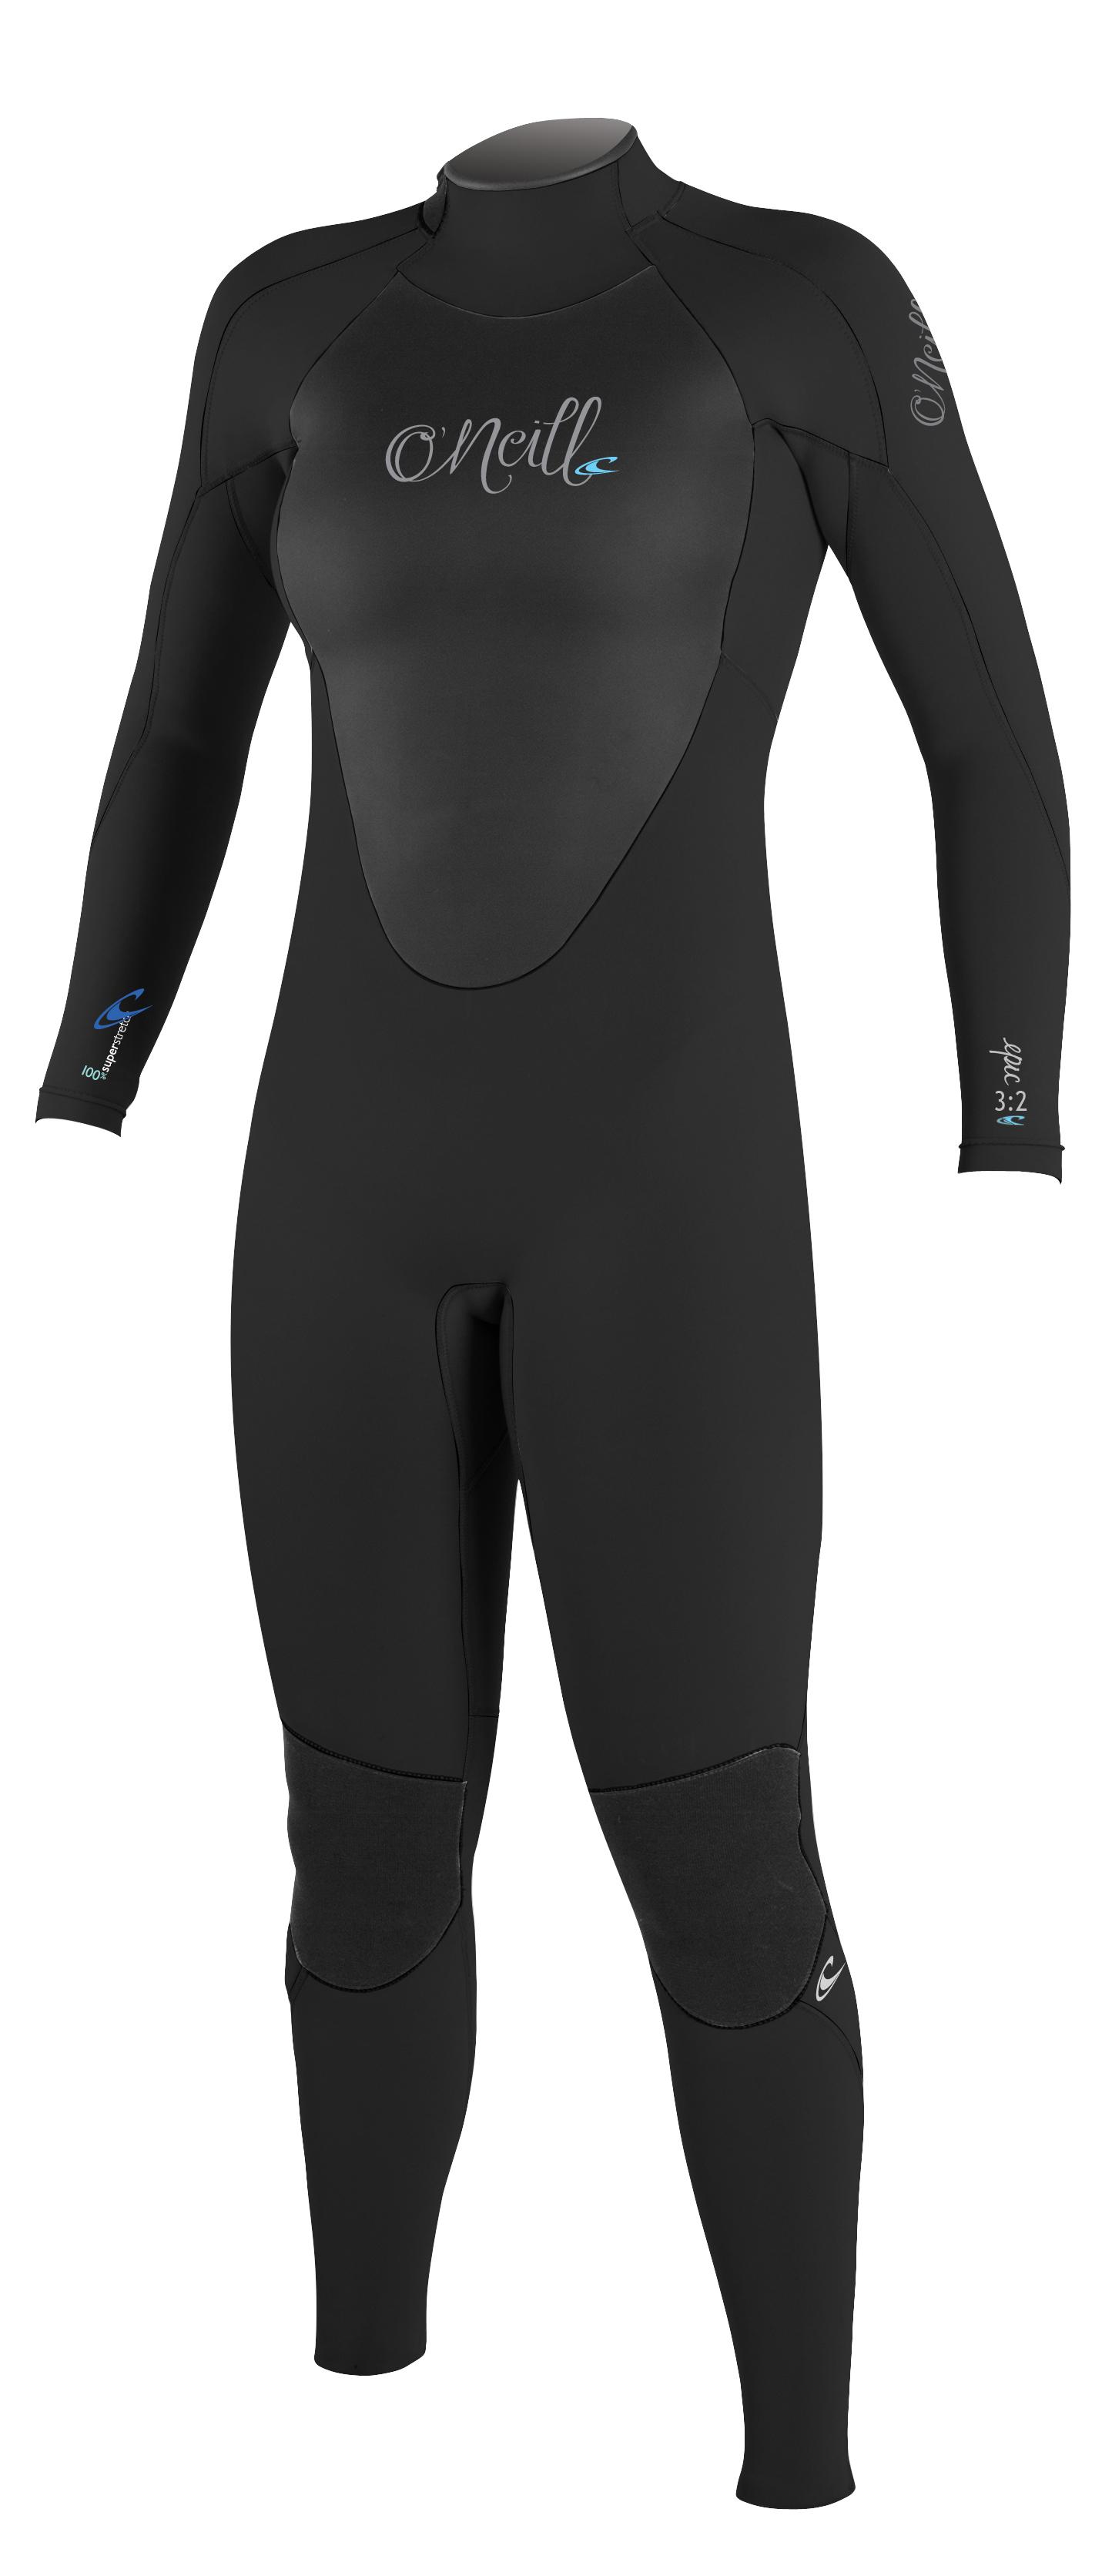 2018 O'Neill Womens Epic 5/4mm Back Zip GBS Wetsuit BLACK / BLACK 4218